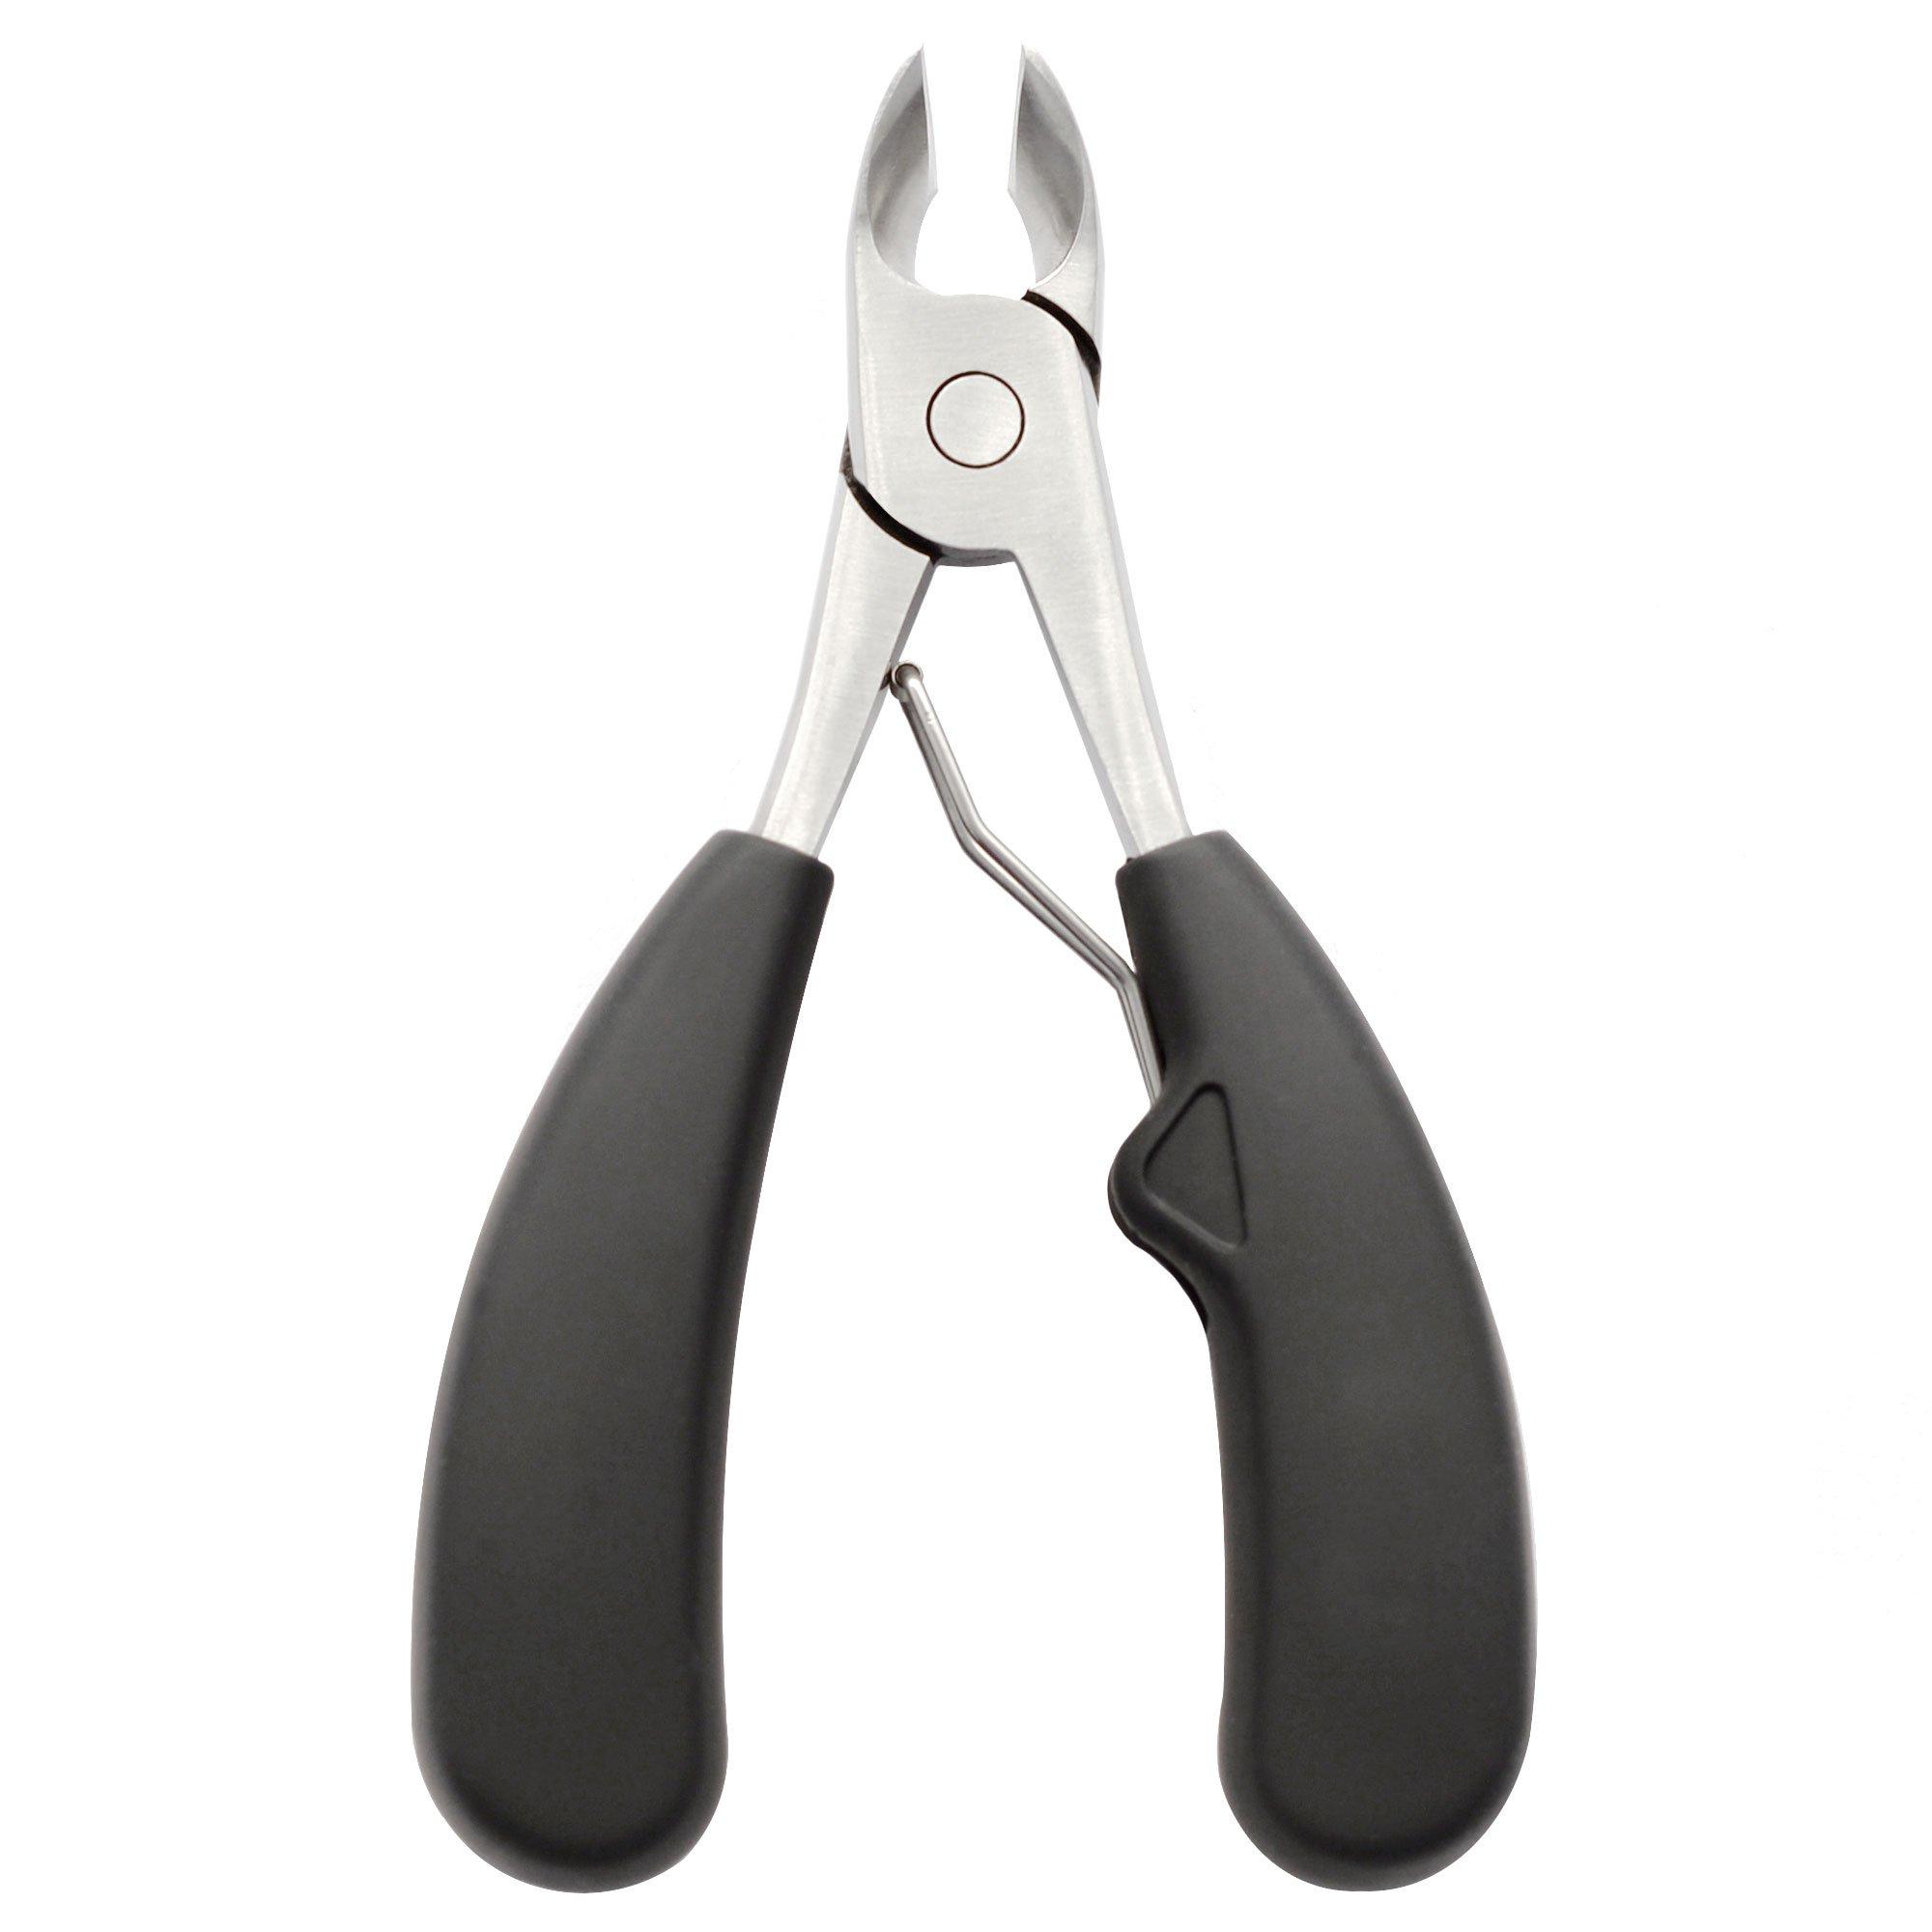 Harperton Nippit - Precision Toenail Clipper Tool for Thick or Ingrown Toenails by Harperton (Image #2)